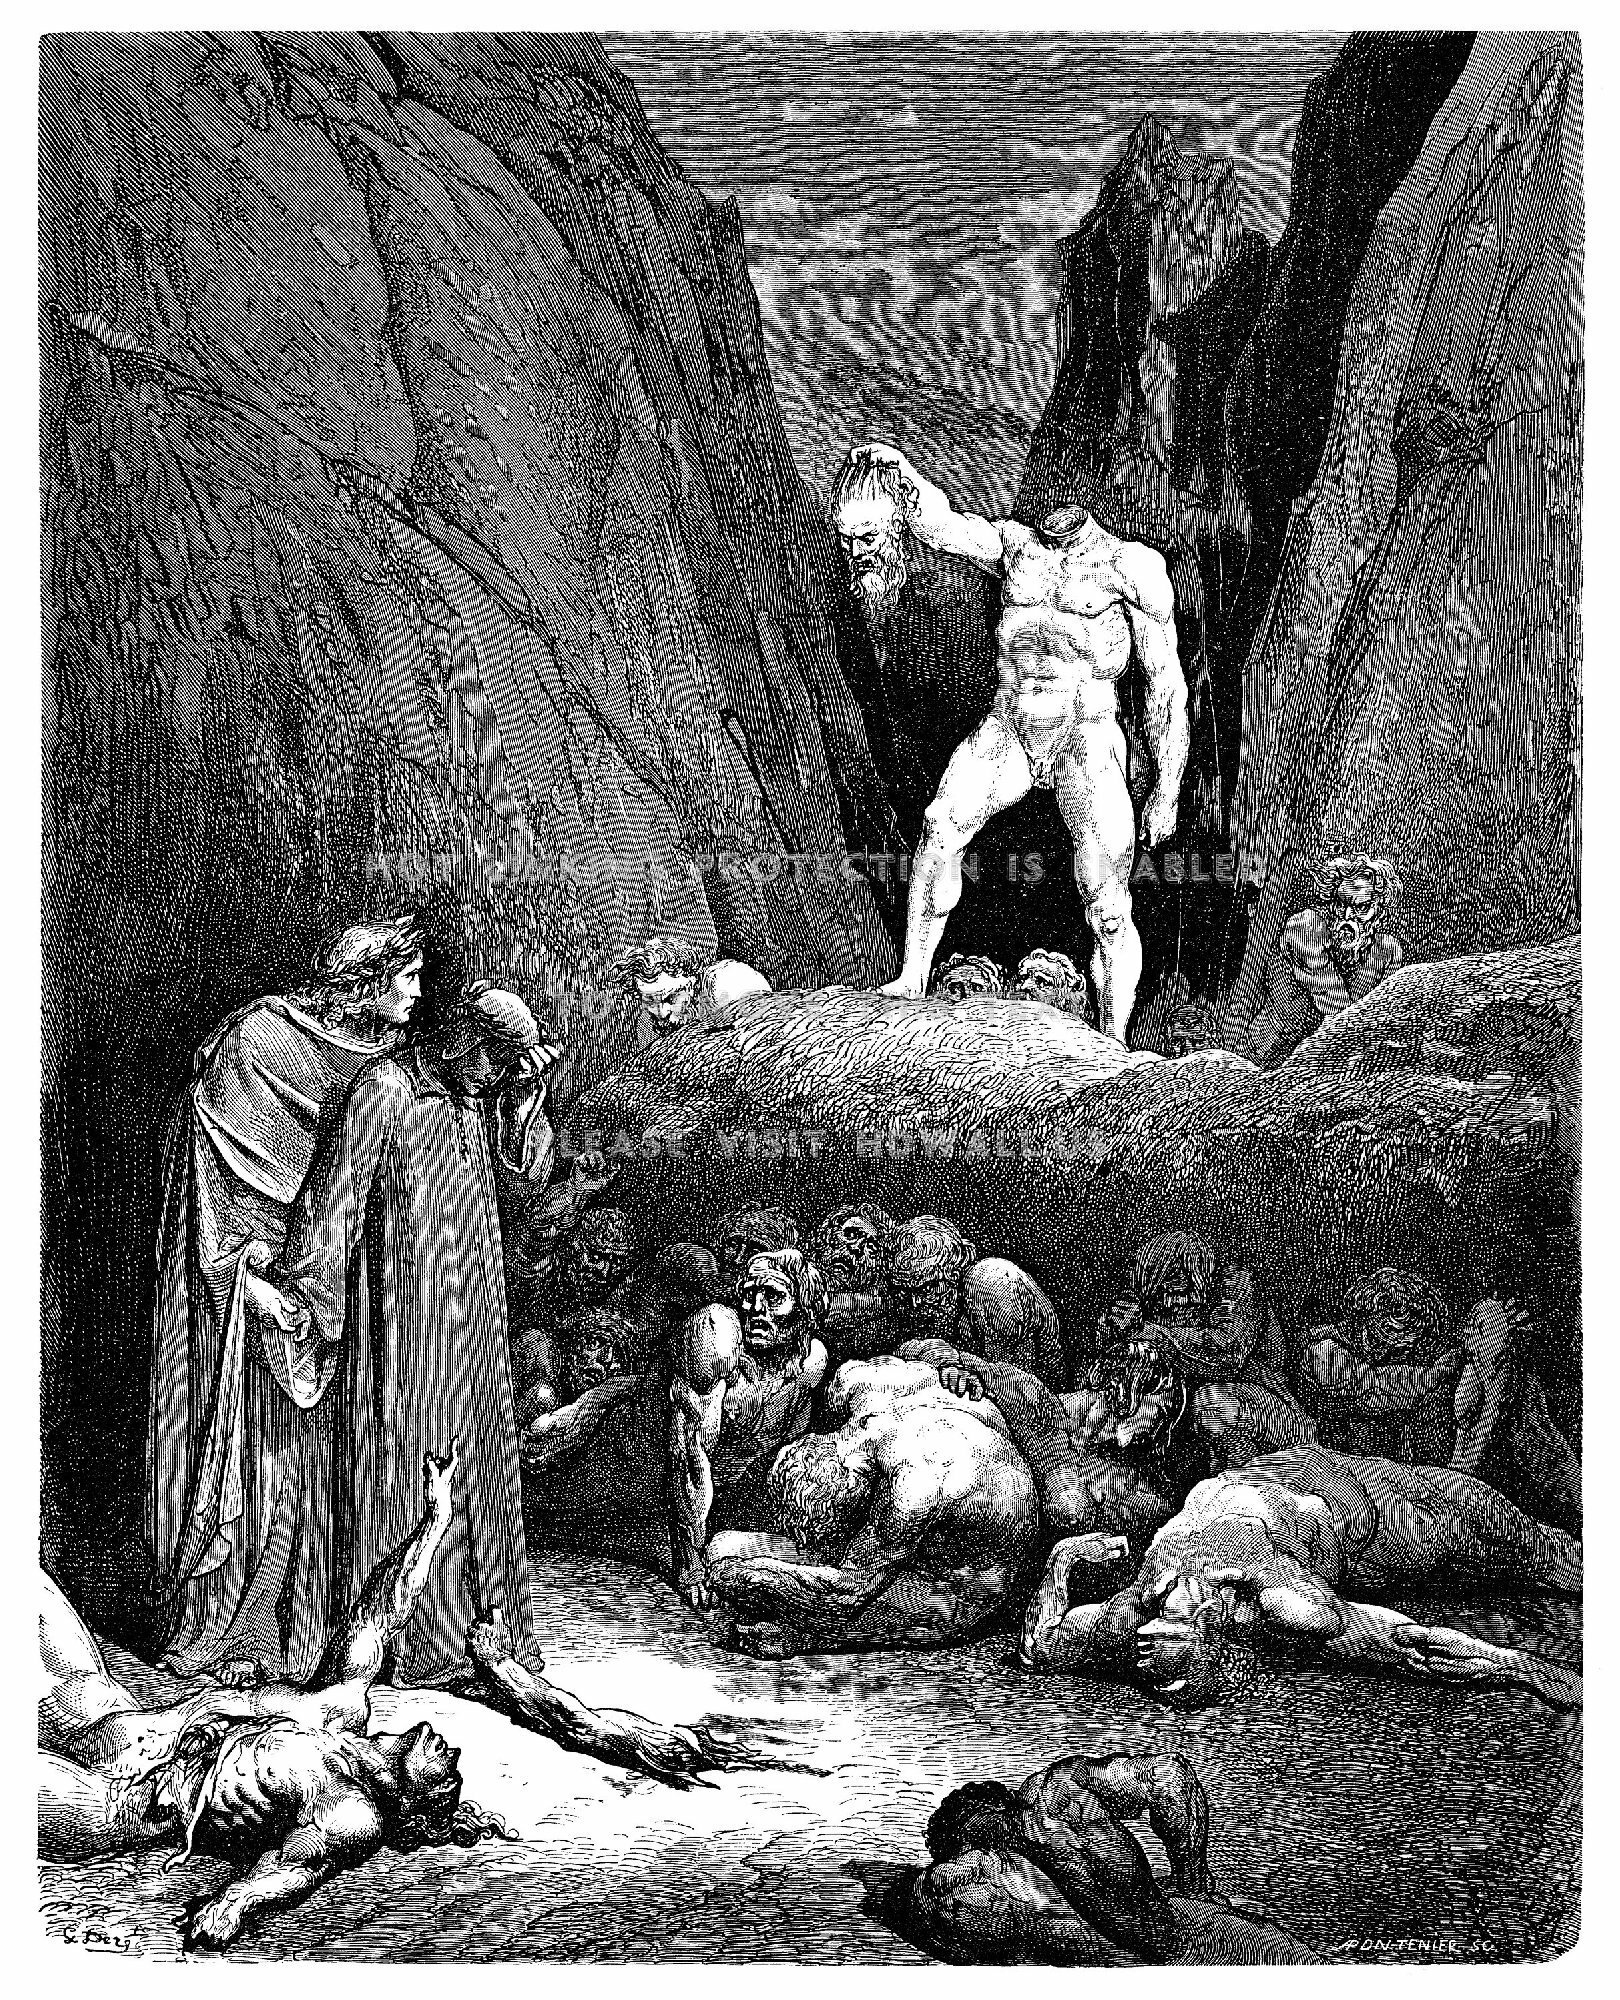 Dante S Inferno 1366382 Hd Wallpaper Backgrounds Download